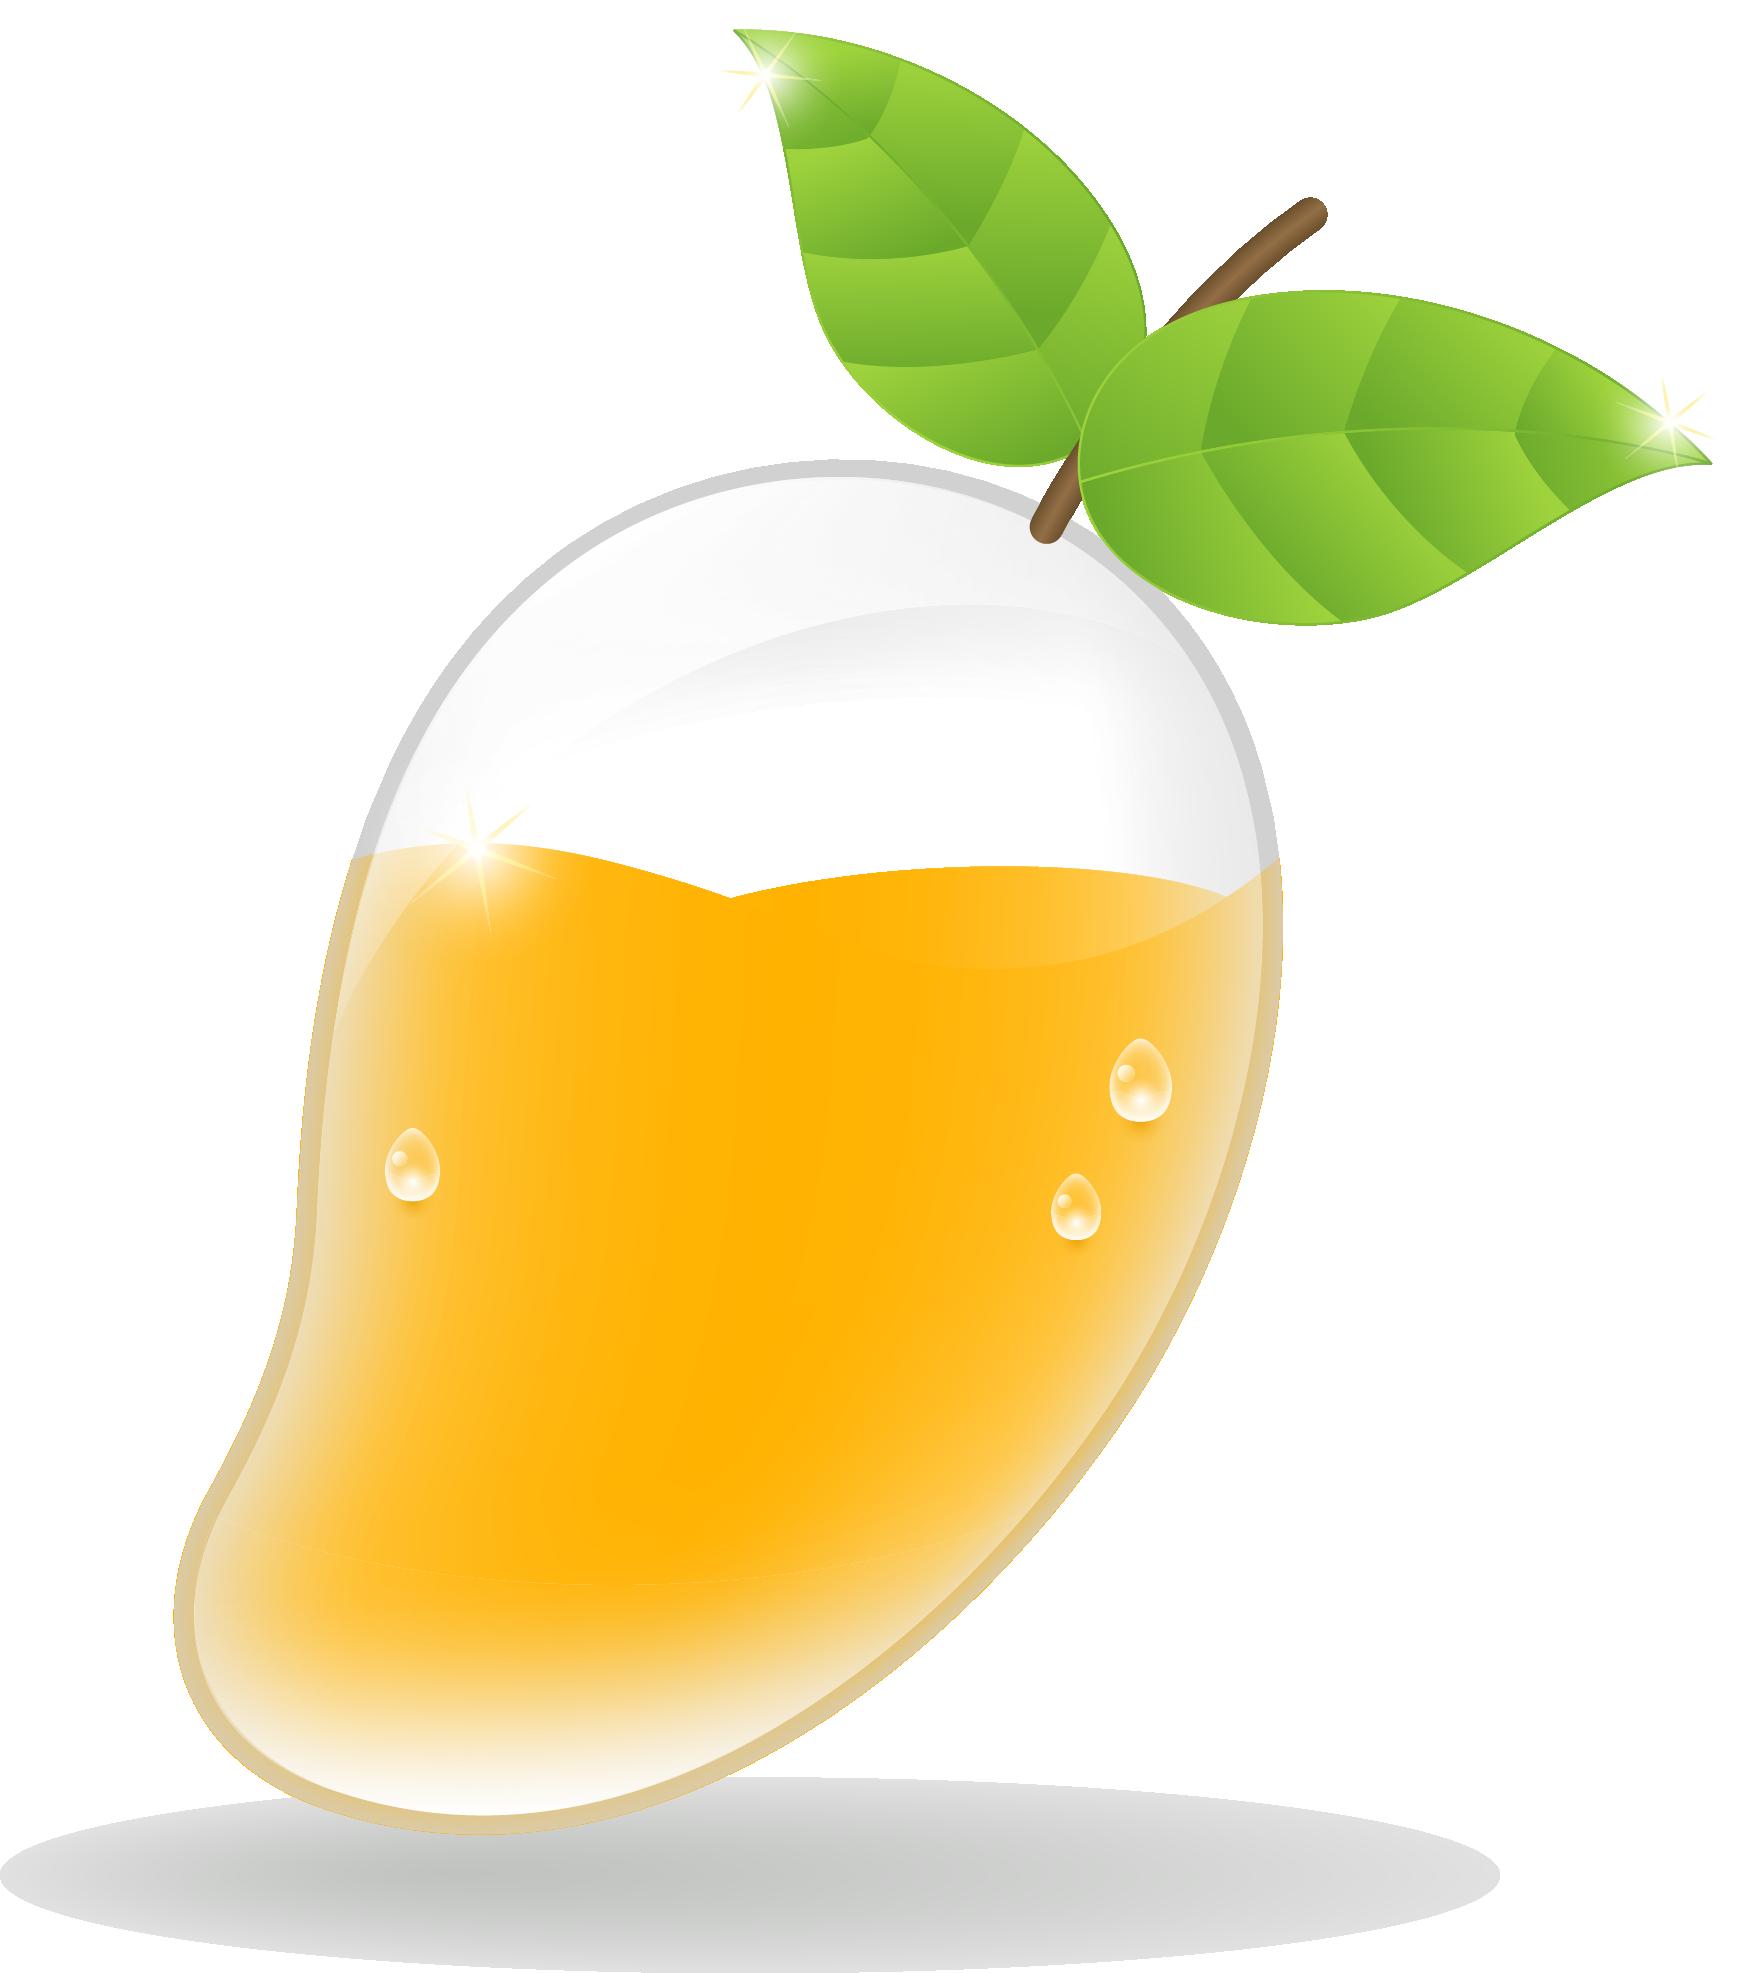 Mango clipart fruts. Orange juice fruit drink